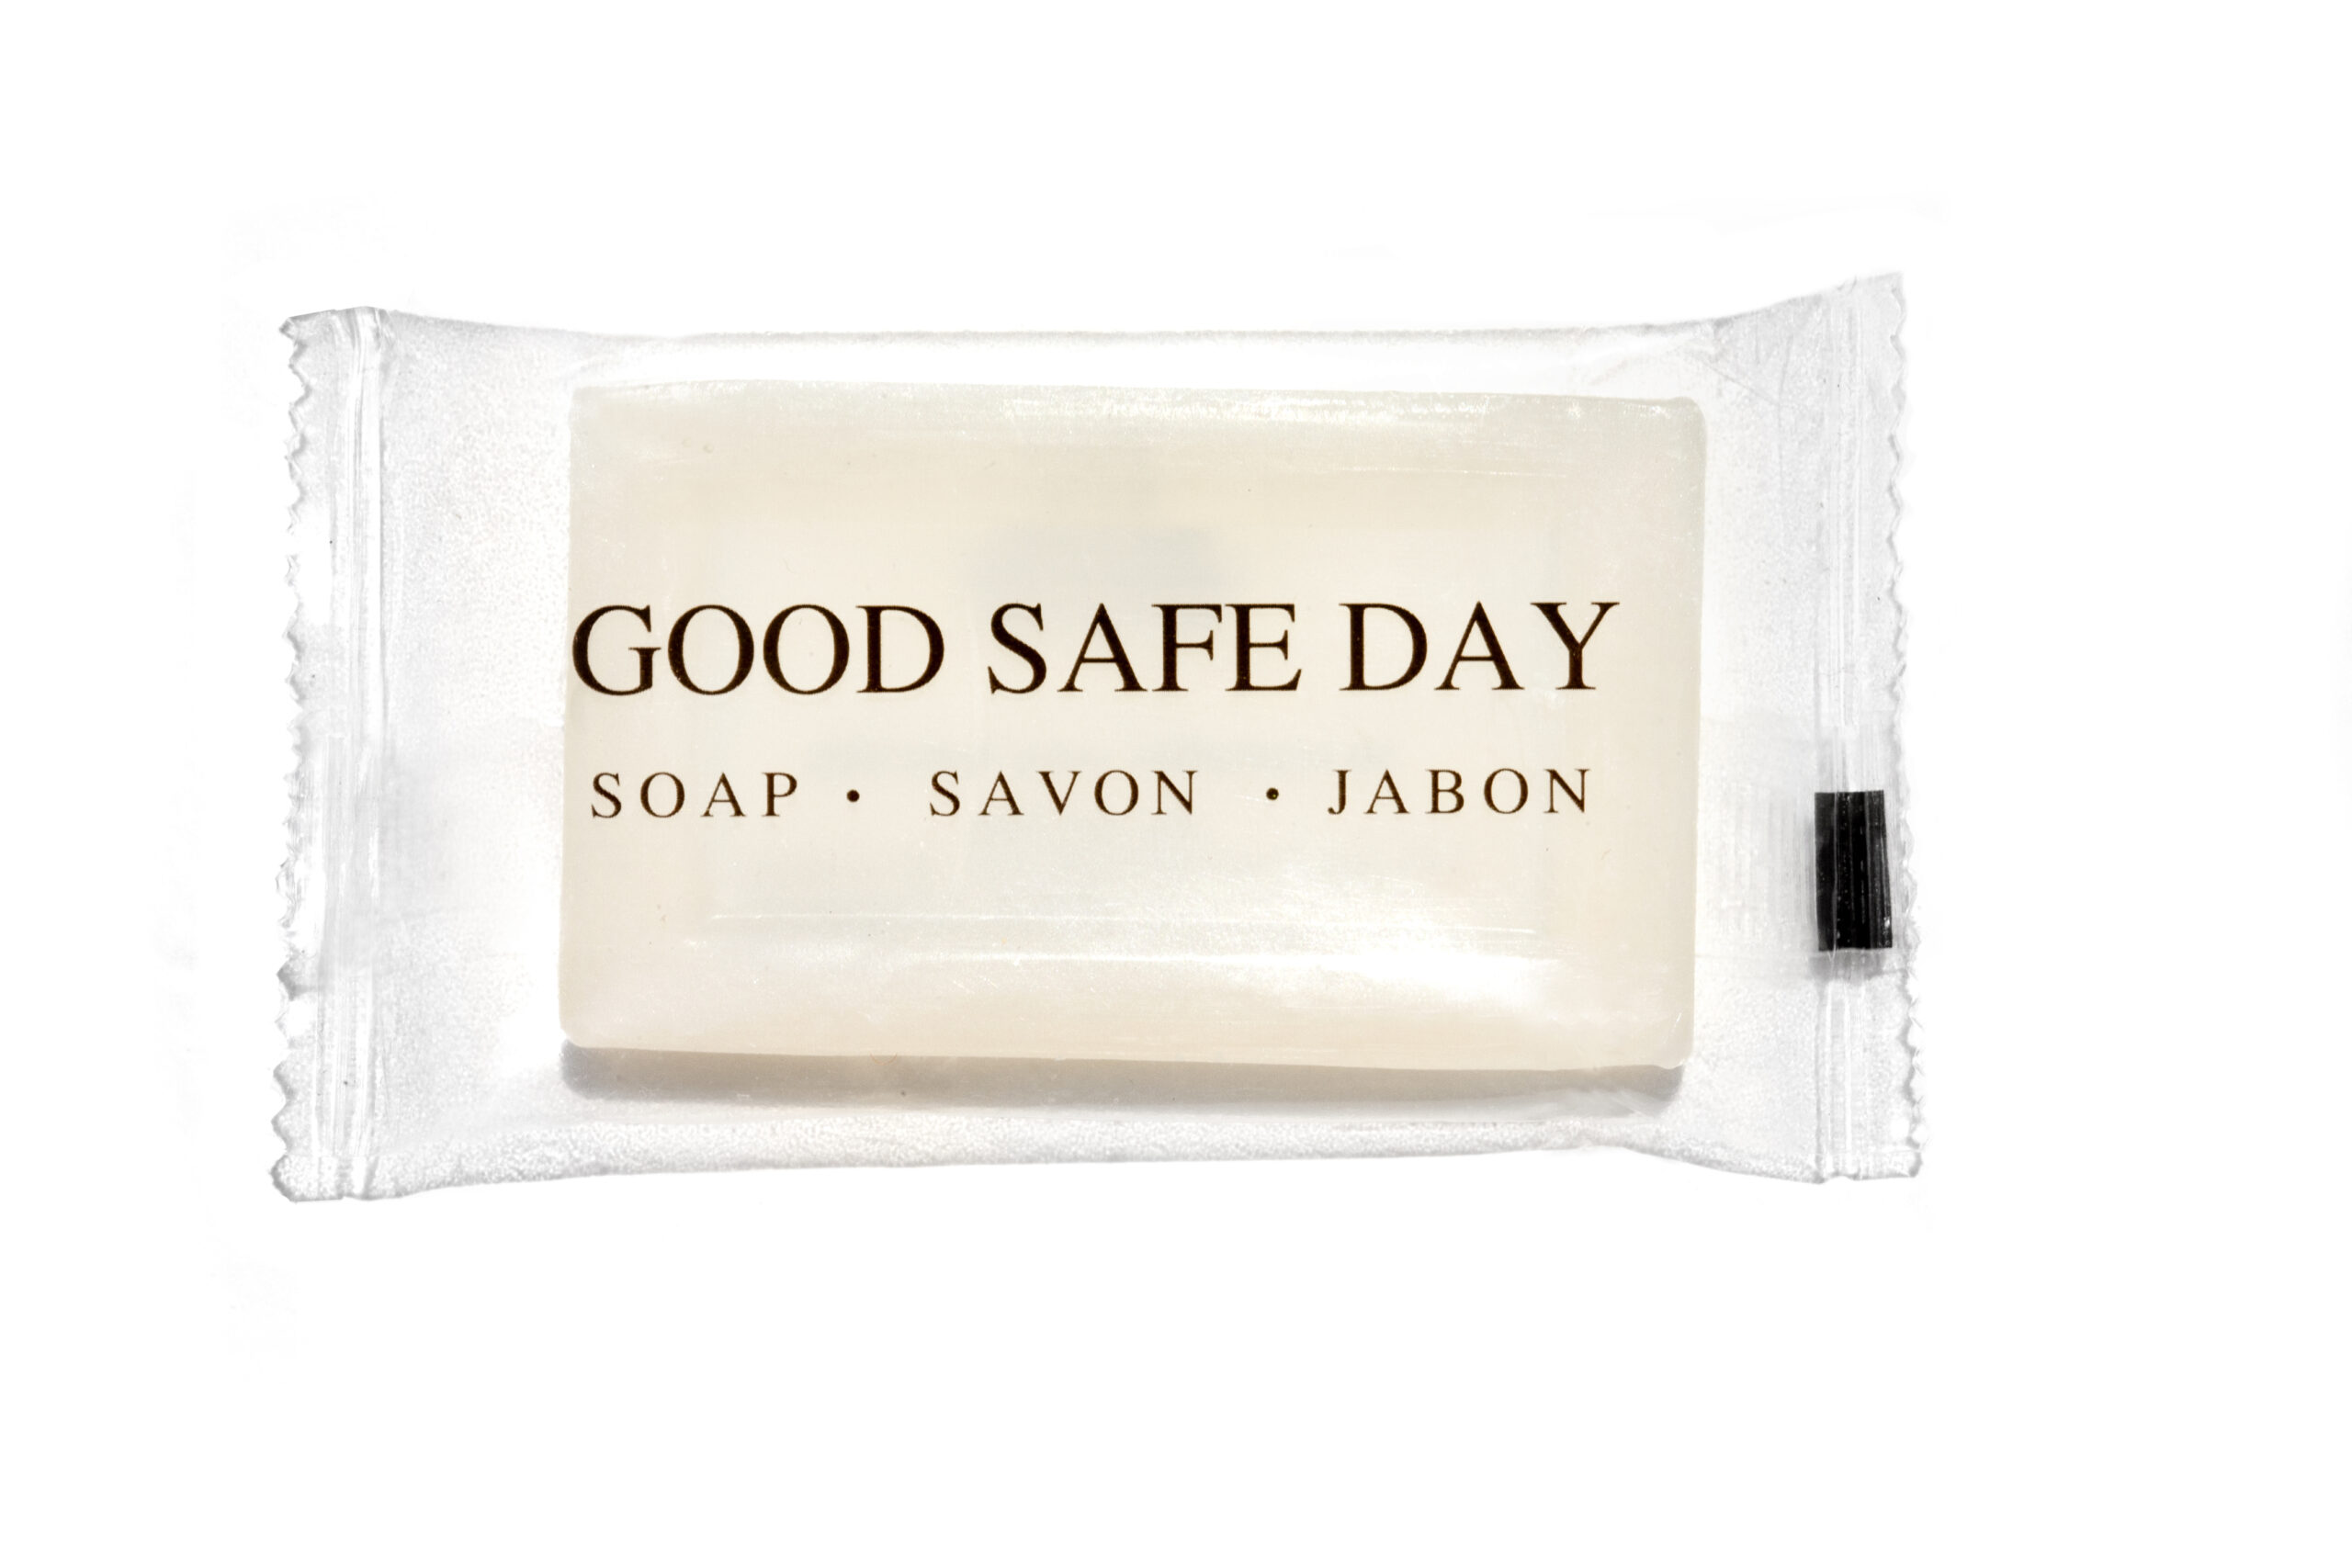 Transmacro Amenities Translucent Bar Soap Good Safe Day